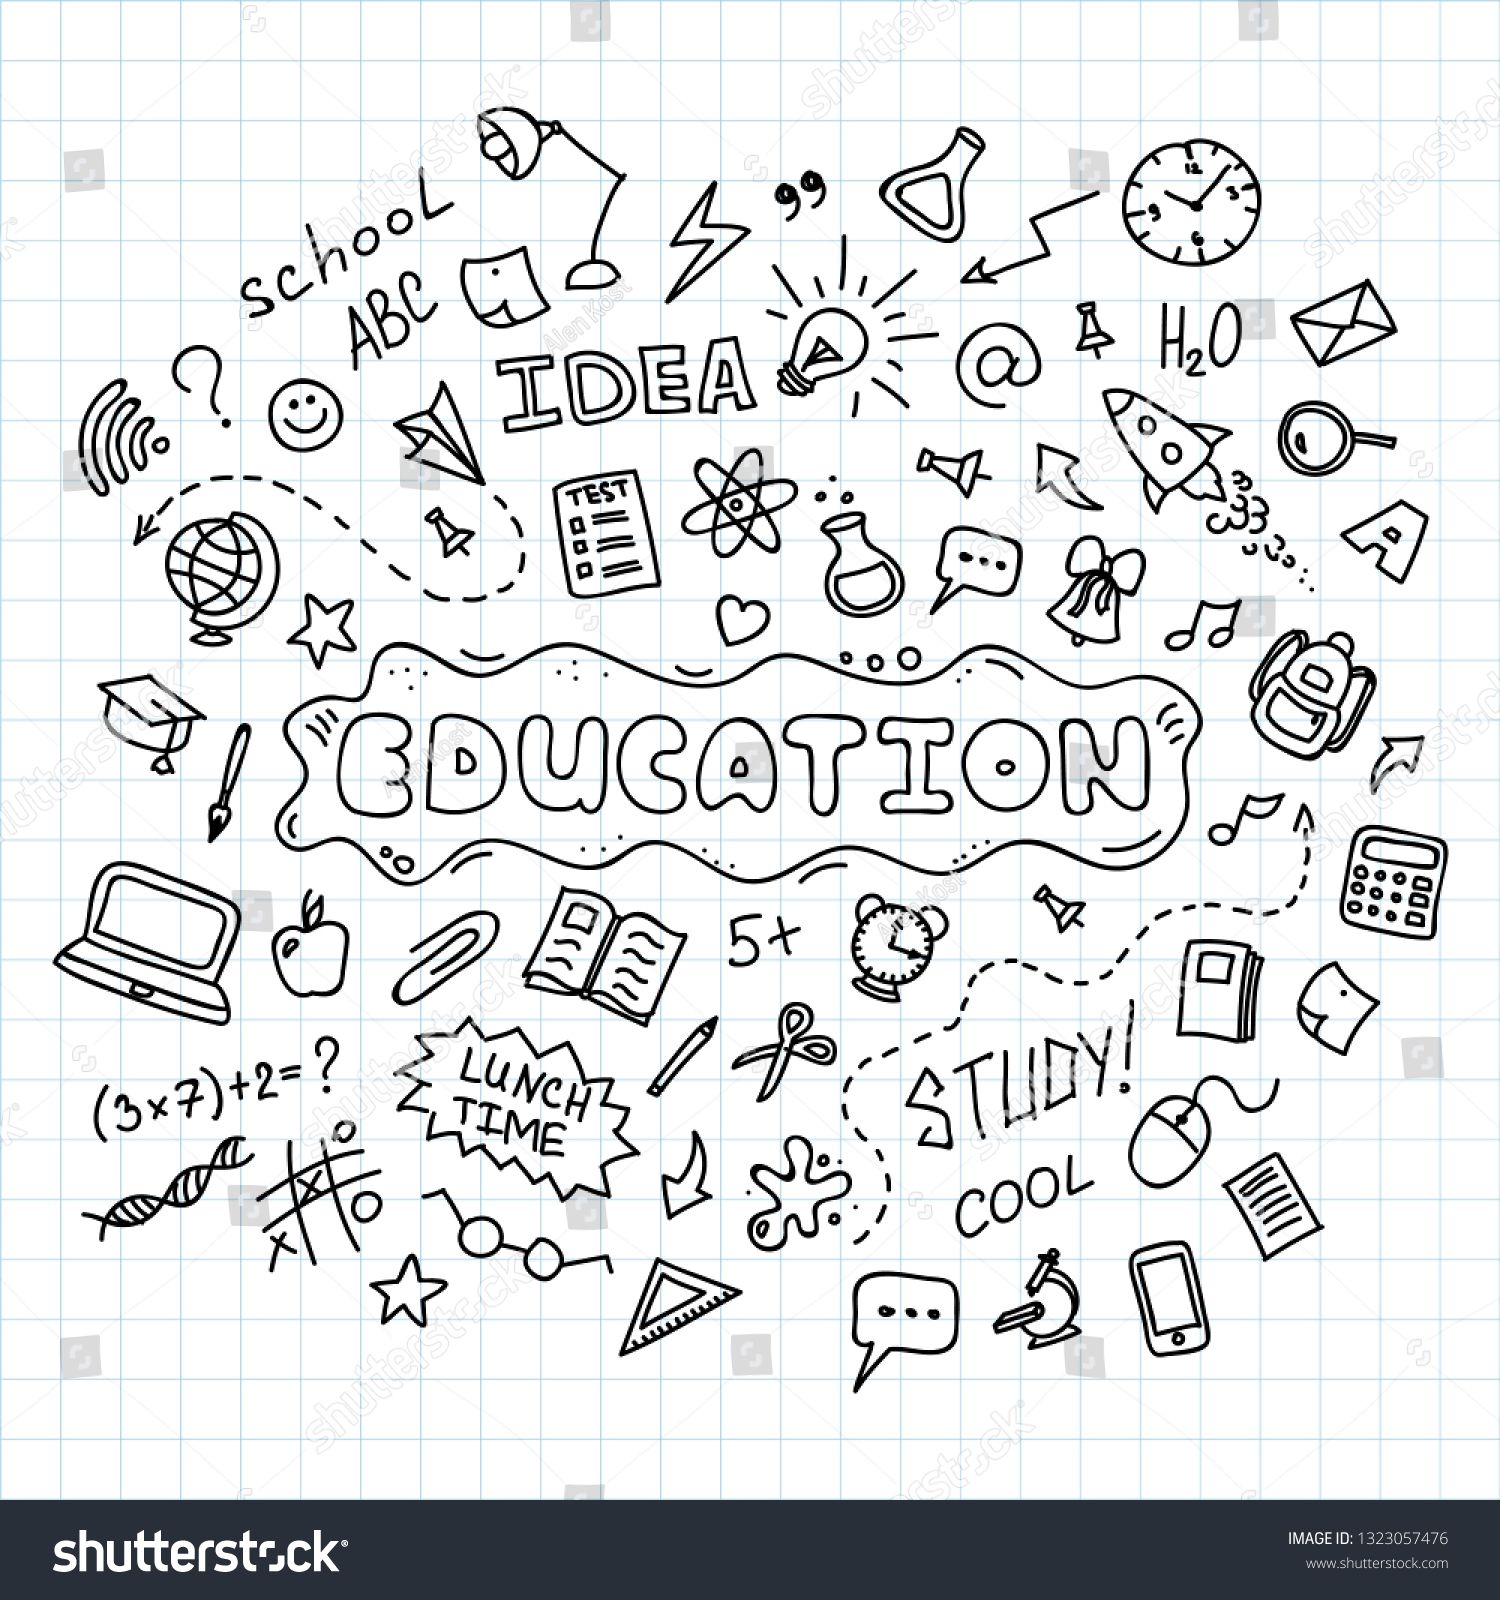 Education concept. Hand drawn school doodles icons set